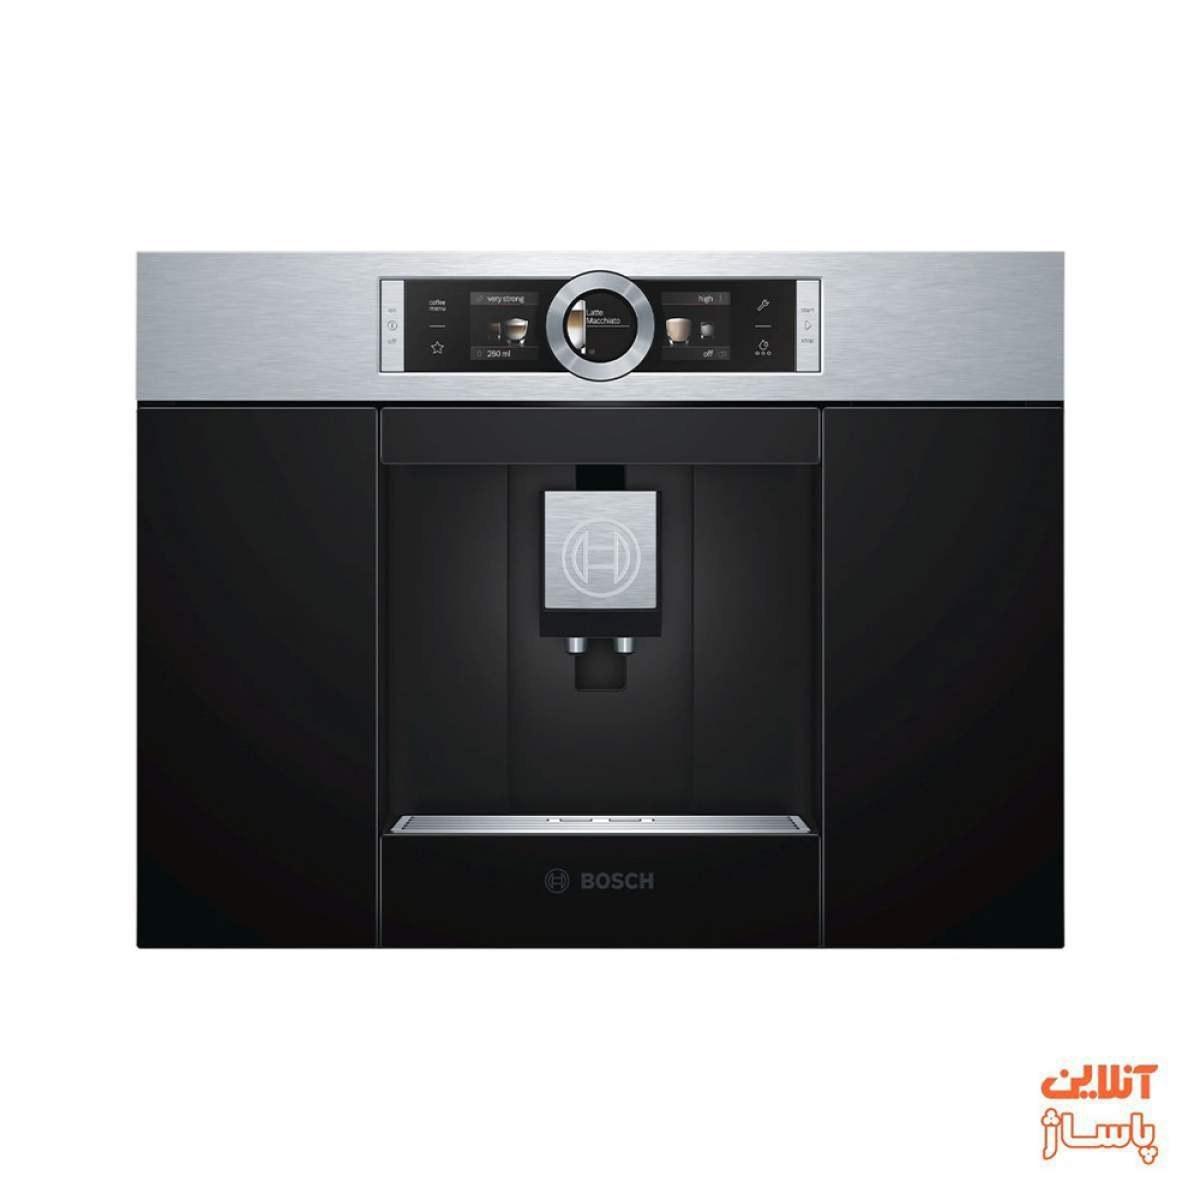 تصویر قهوه ساز بوش مدل CTL636ES1 Bosch CTL636ES1 Coffee Maker